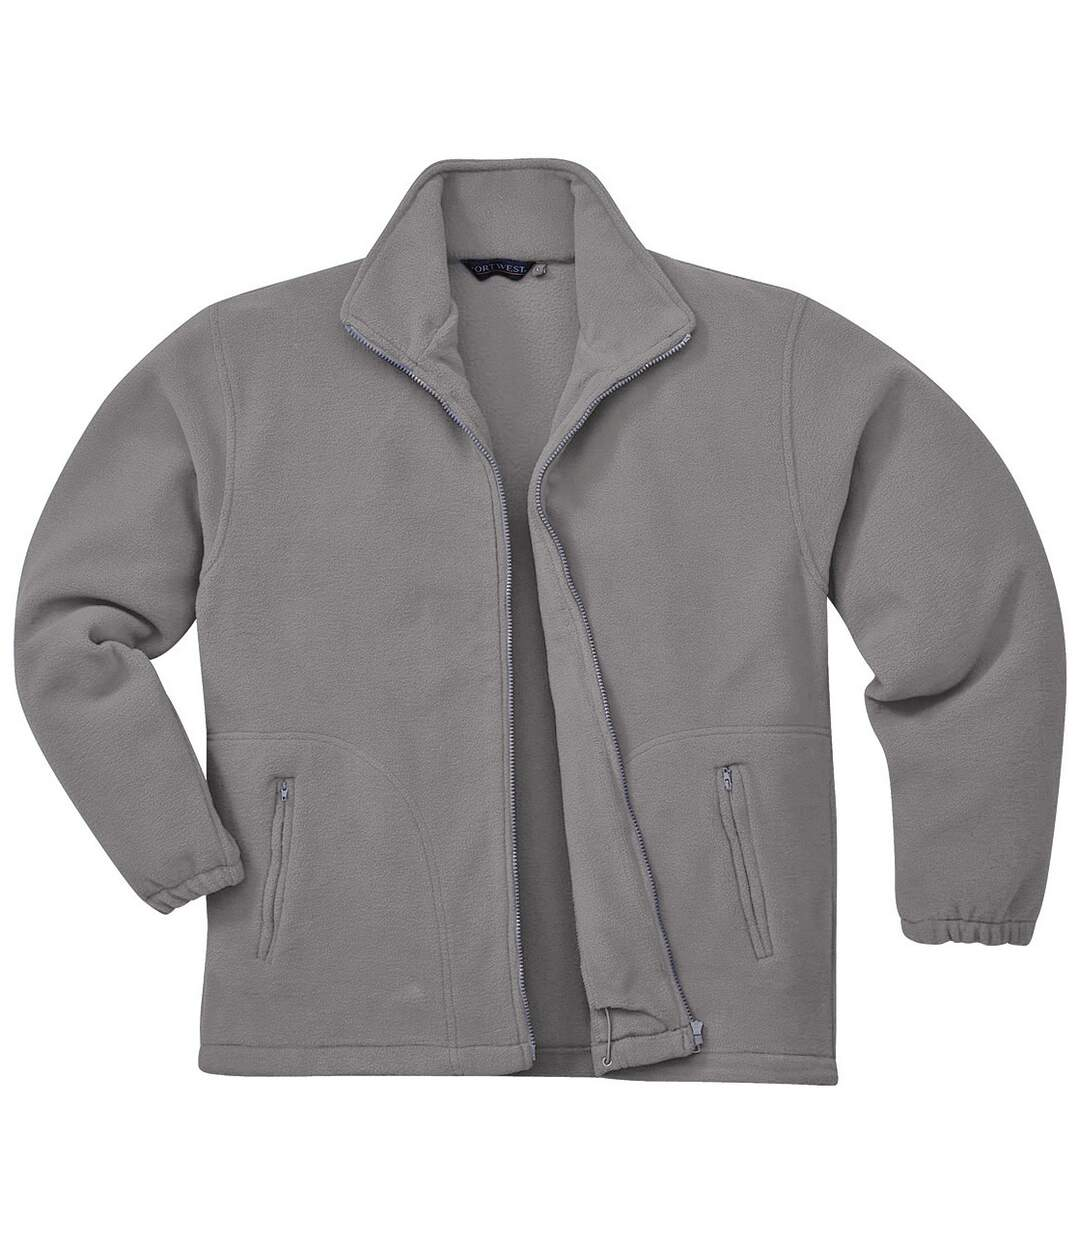 Portwest Mens Argyll Heavy Fleece Anti-Pill Jacket (F400) (Black) - UTRW1026